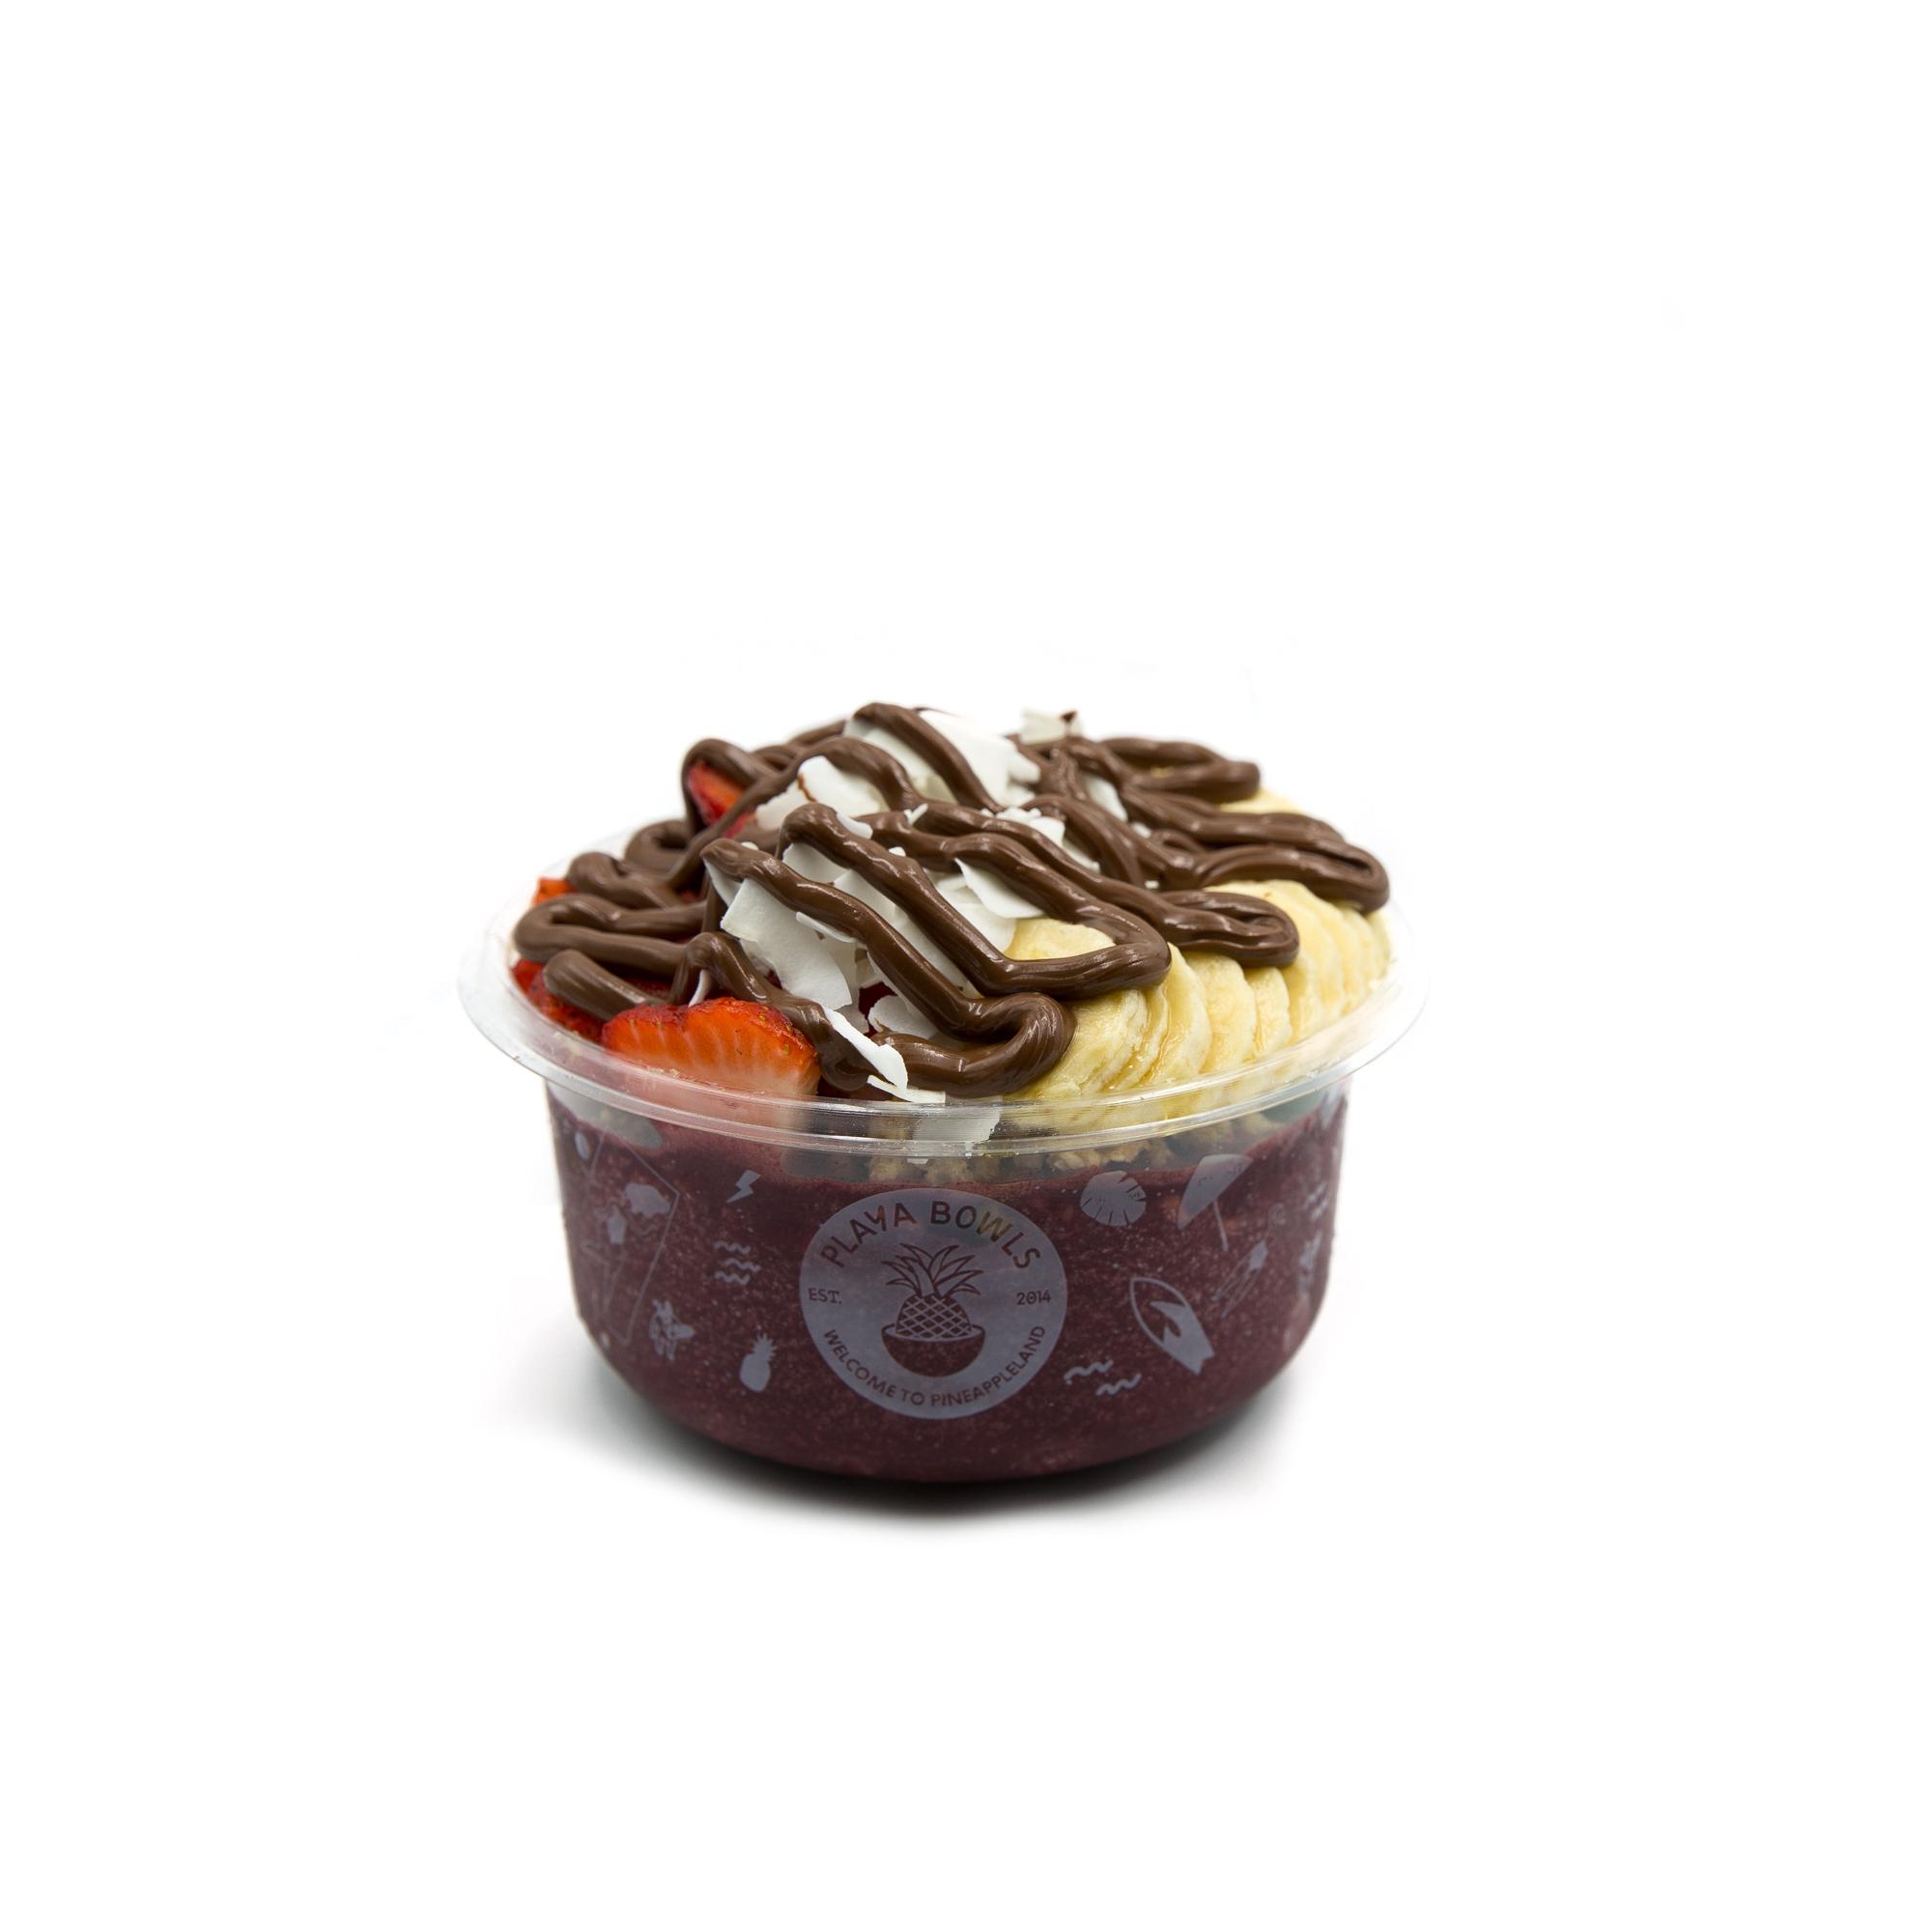 Nutella Acai Bowl